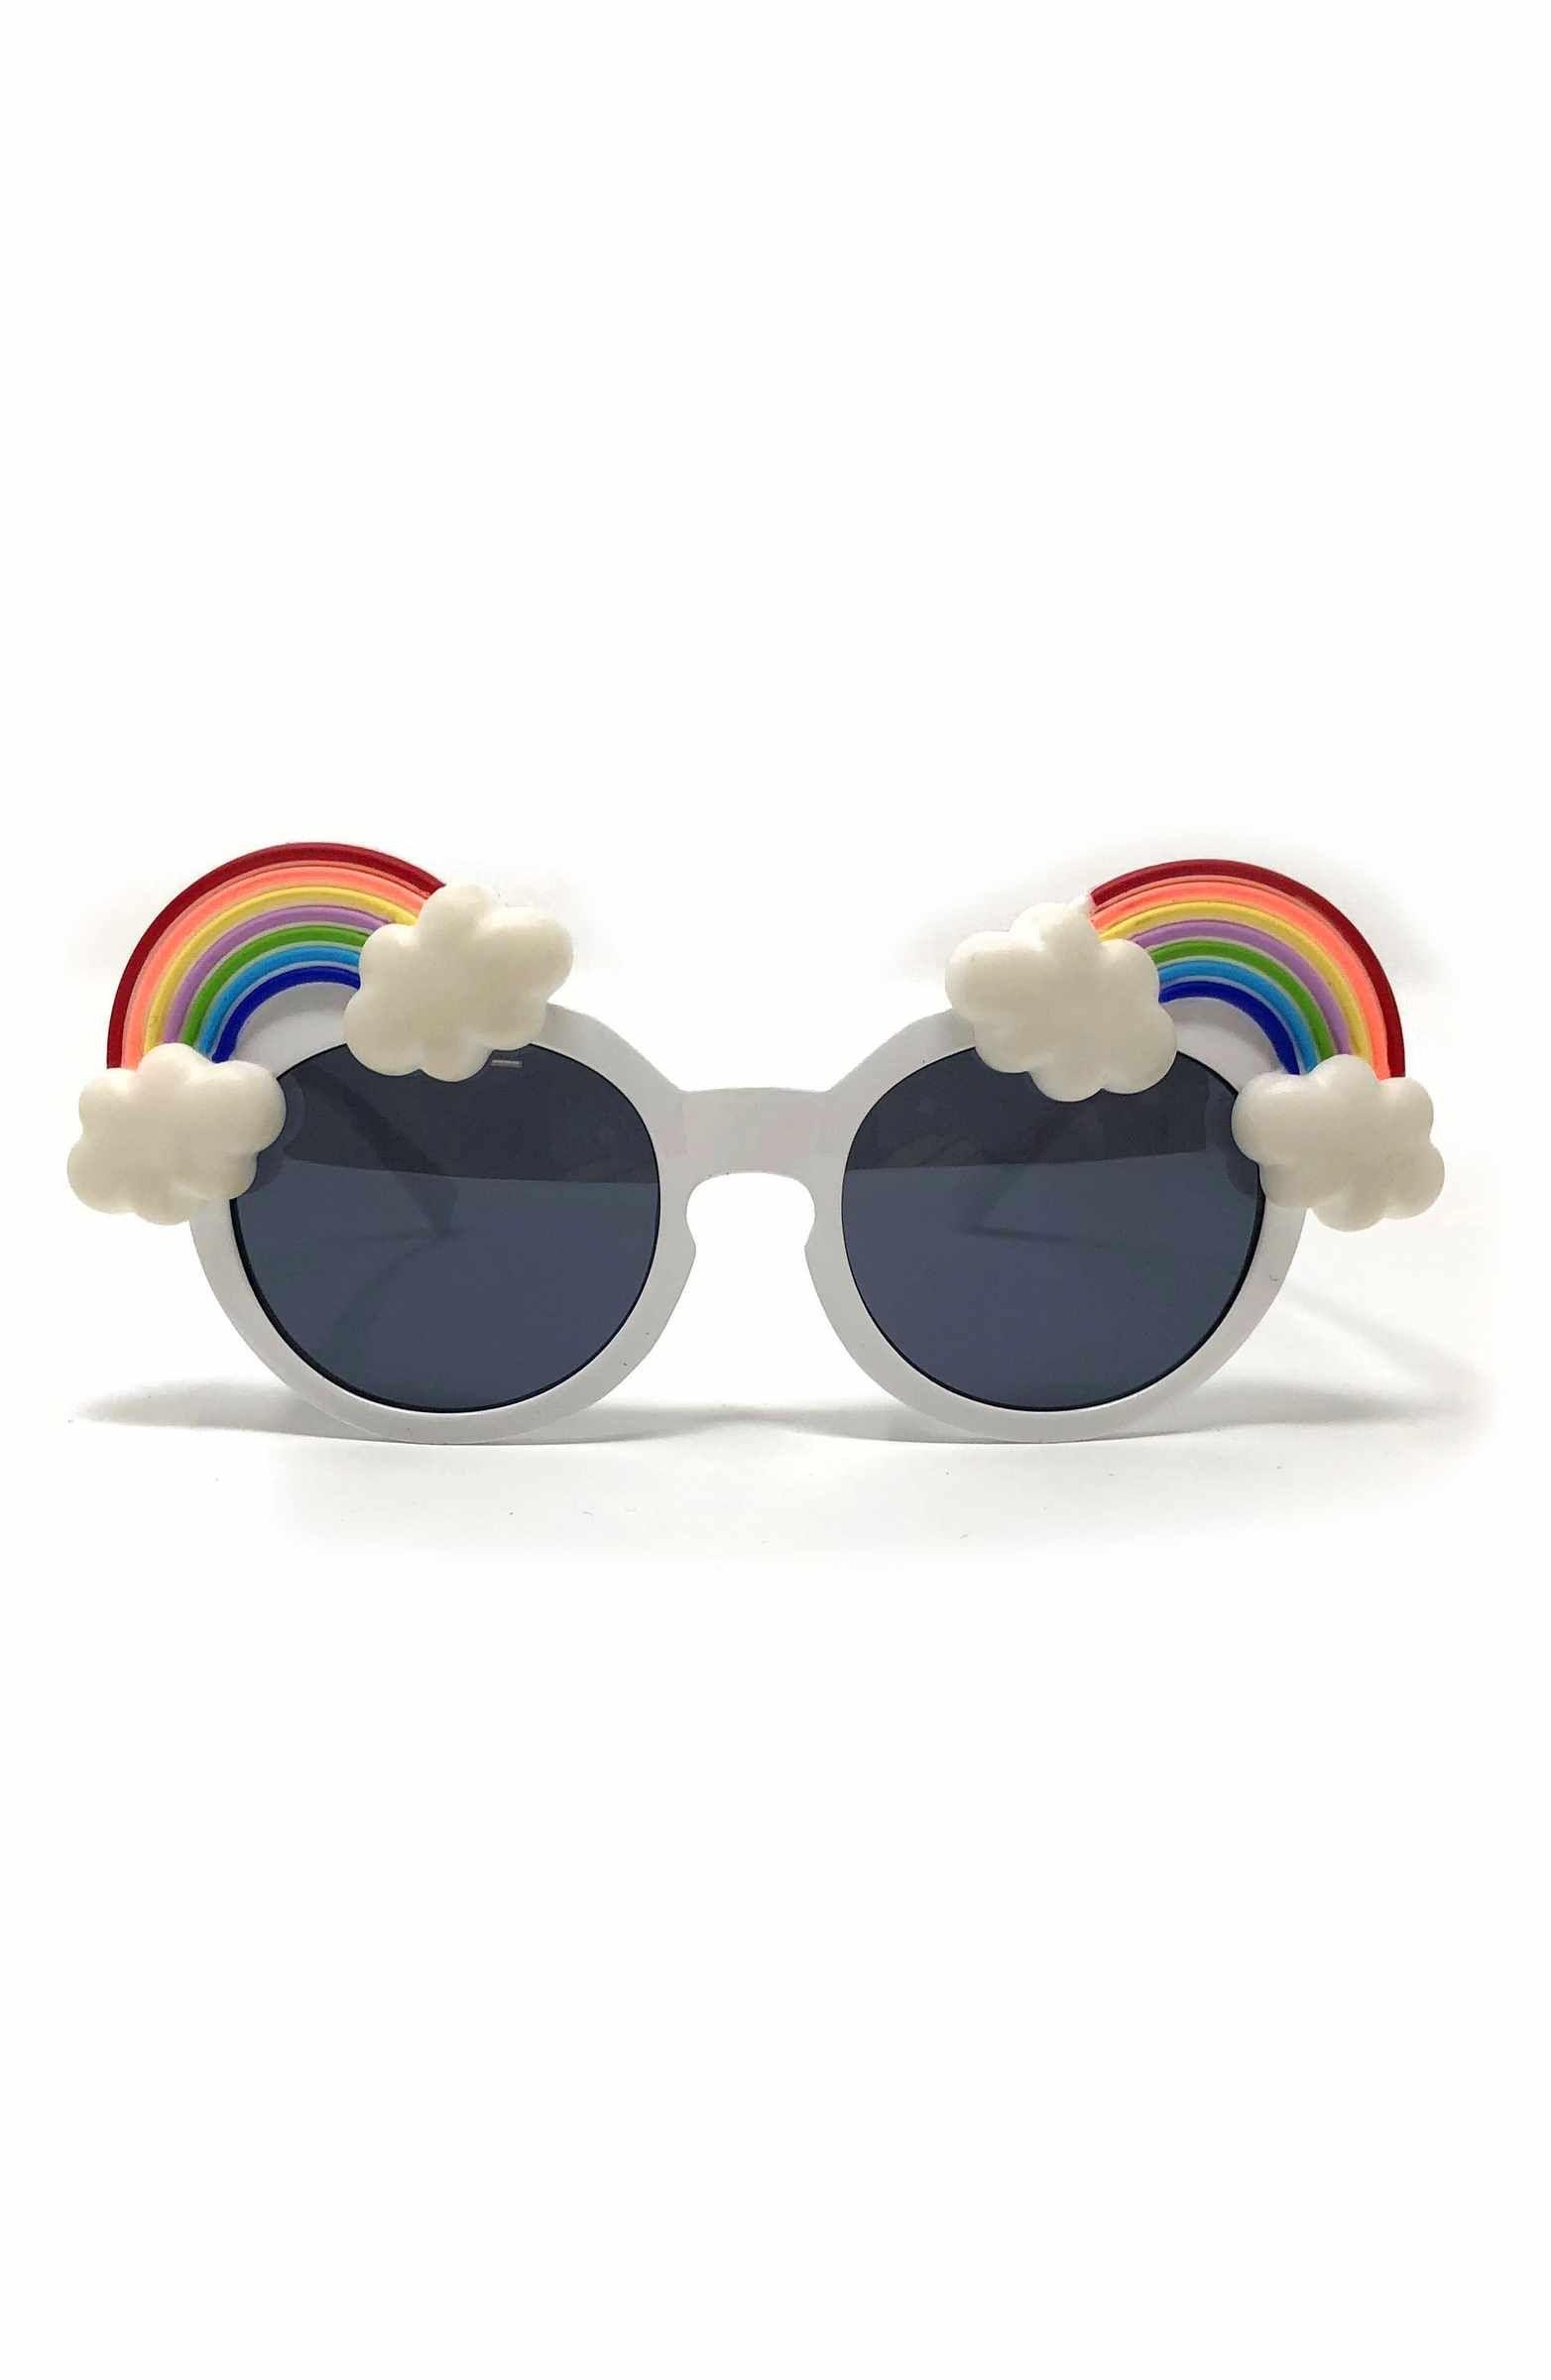 Main Image Loose Leaf Eyewear Small Round Rainbow Sunglasses Babiators True Blue Classic Ages 3 7 Toddler